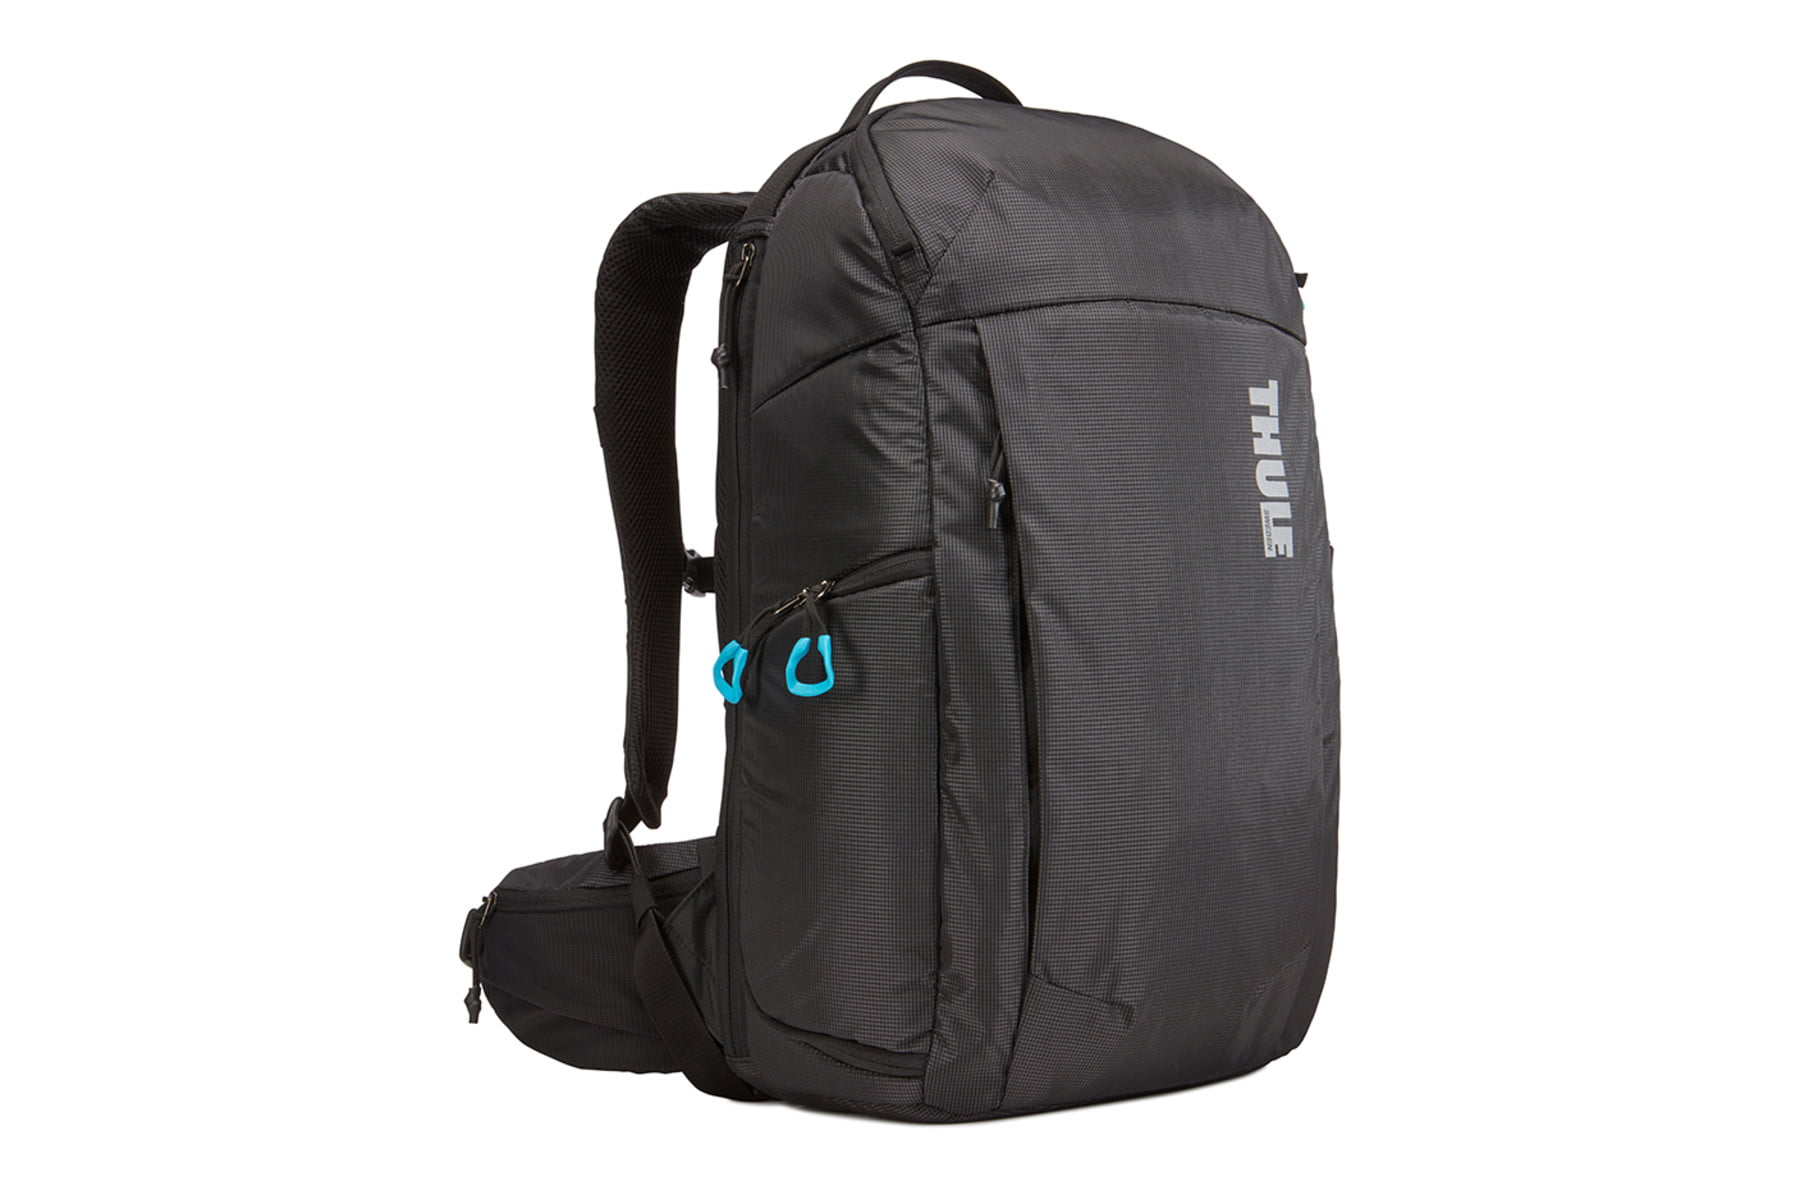 Rucsac foto Thule Aspect DSLR Backpack Negru 1